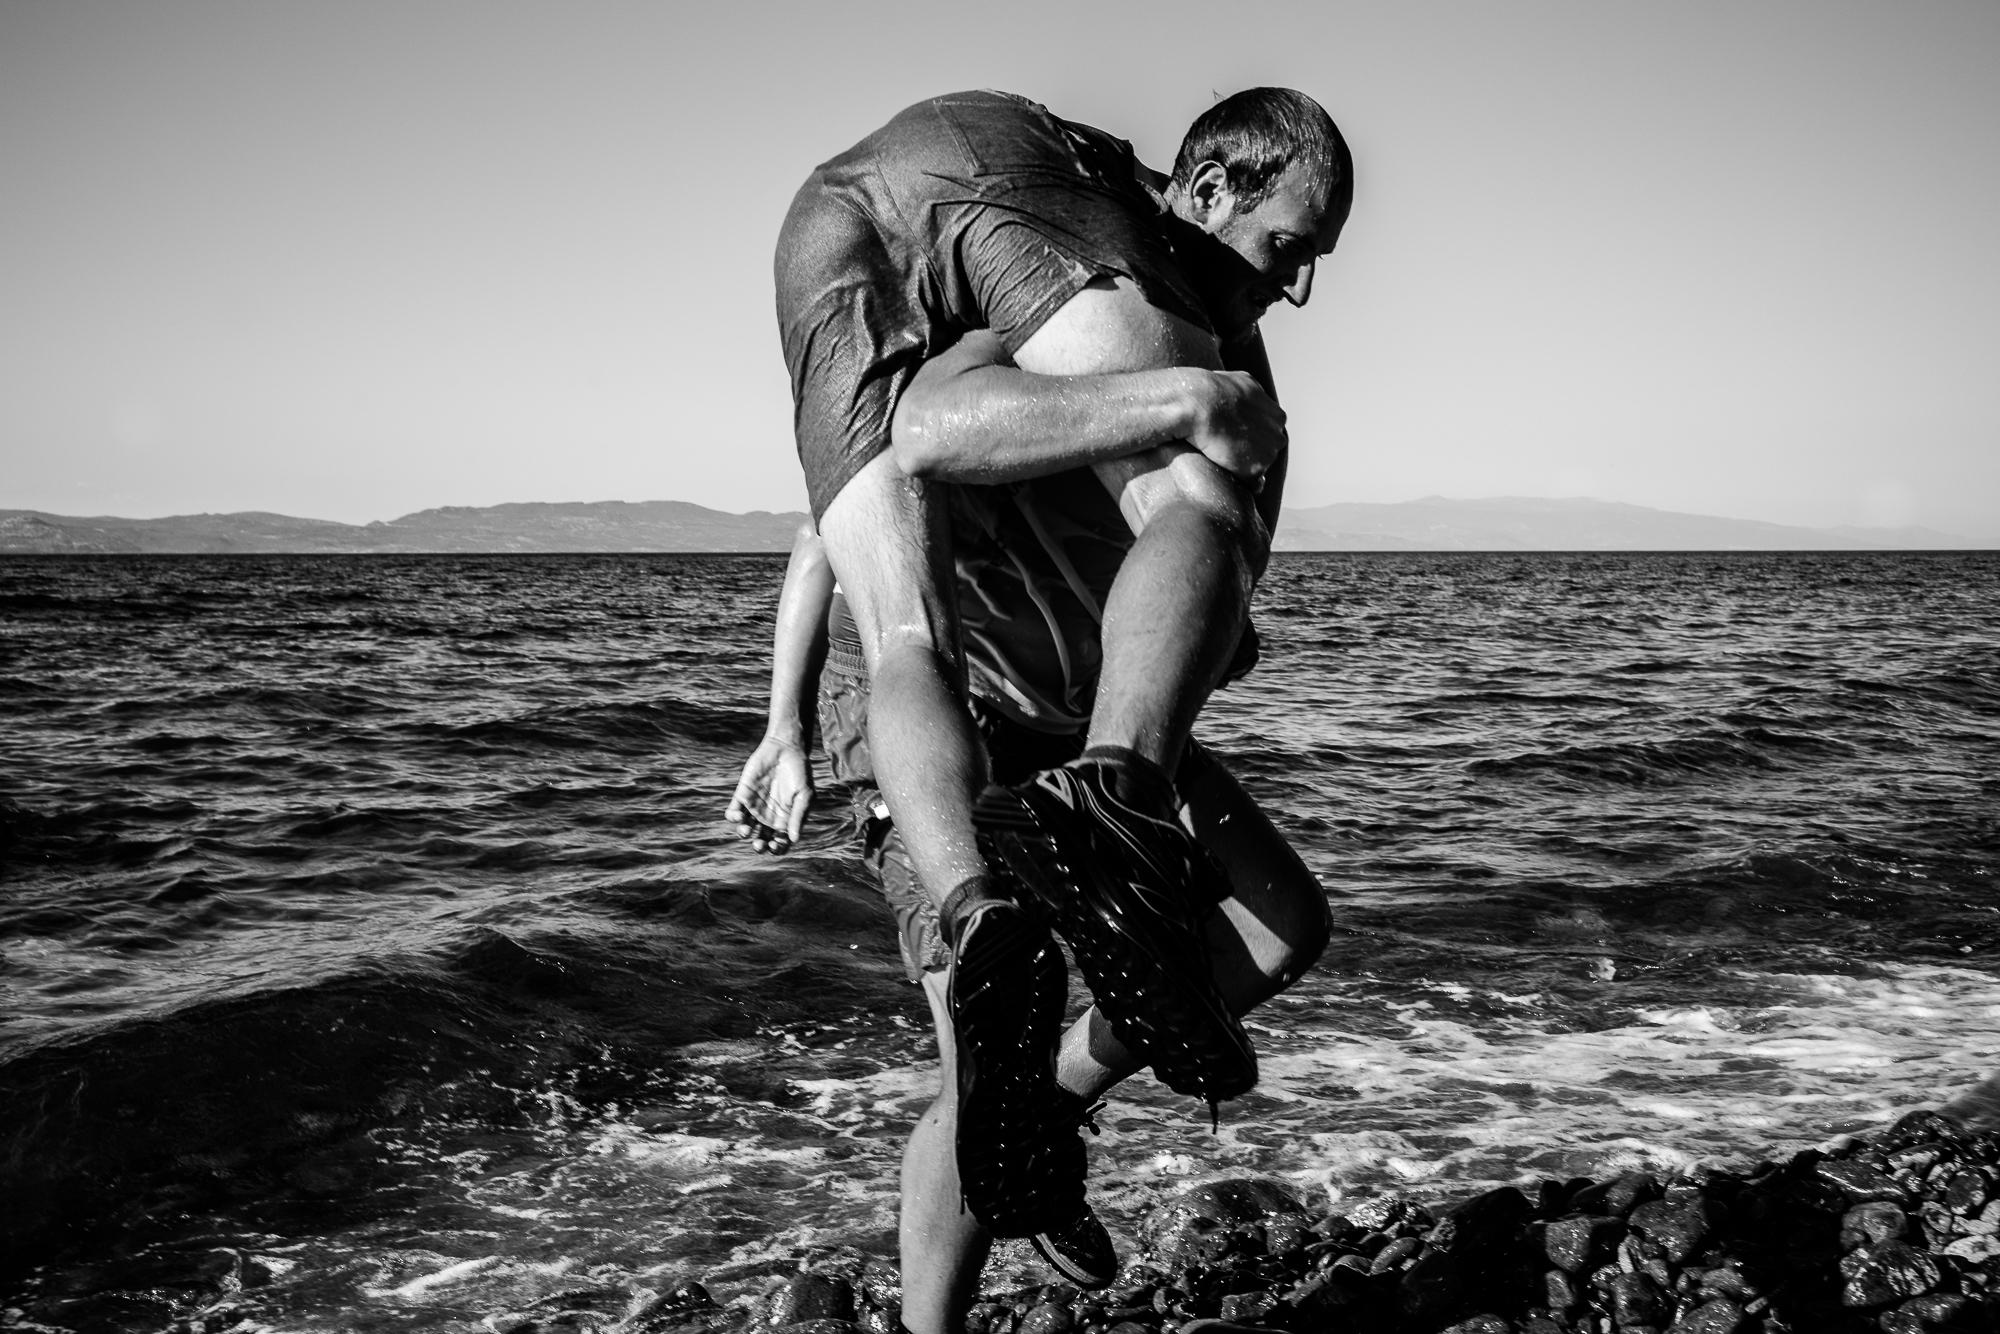 Lifesaver training for volunteers. Lesvos, Greece, 2016